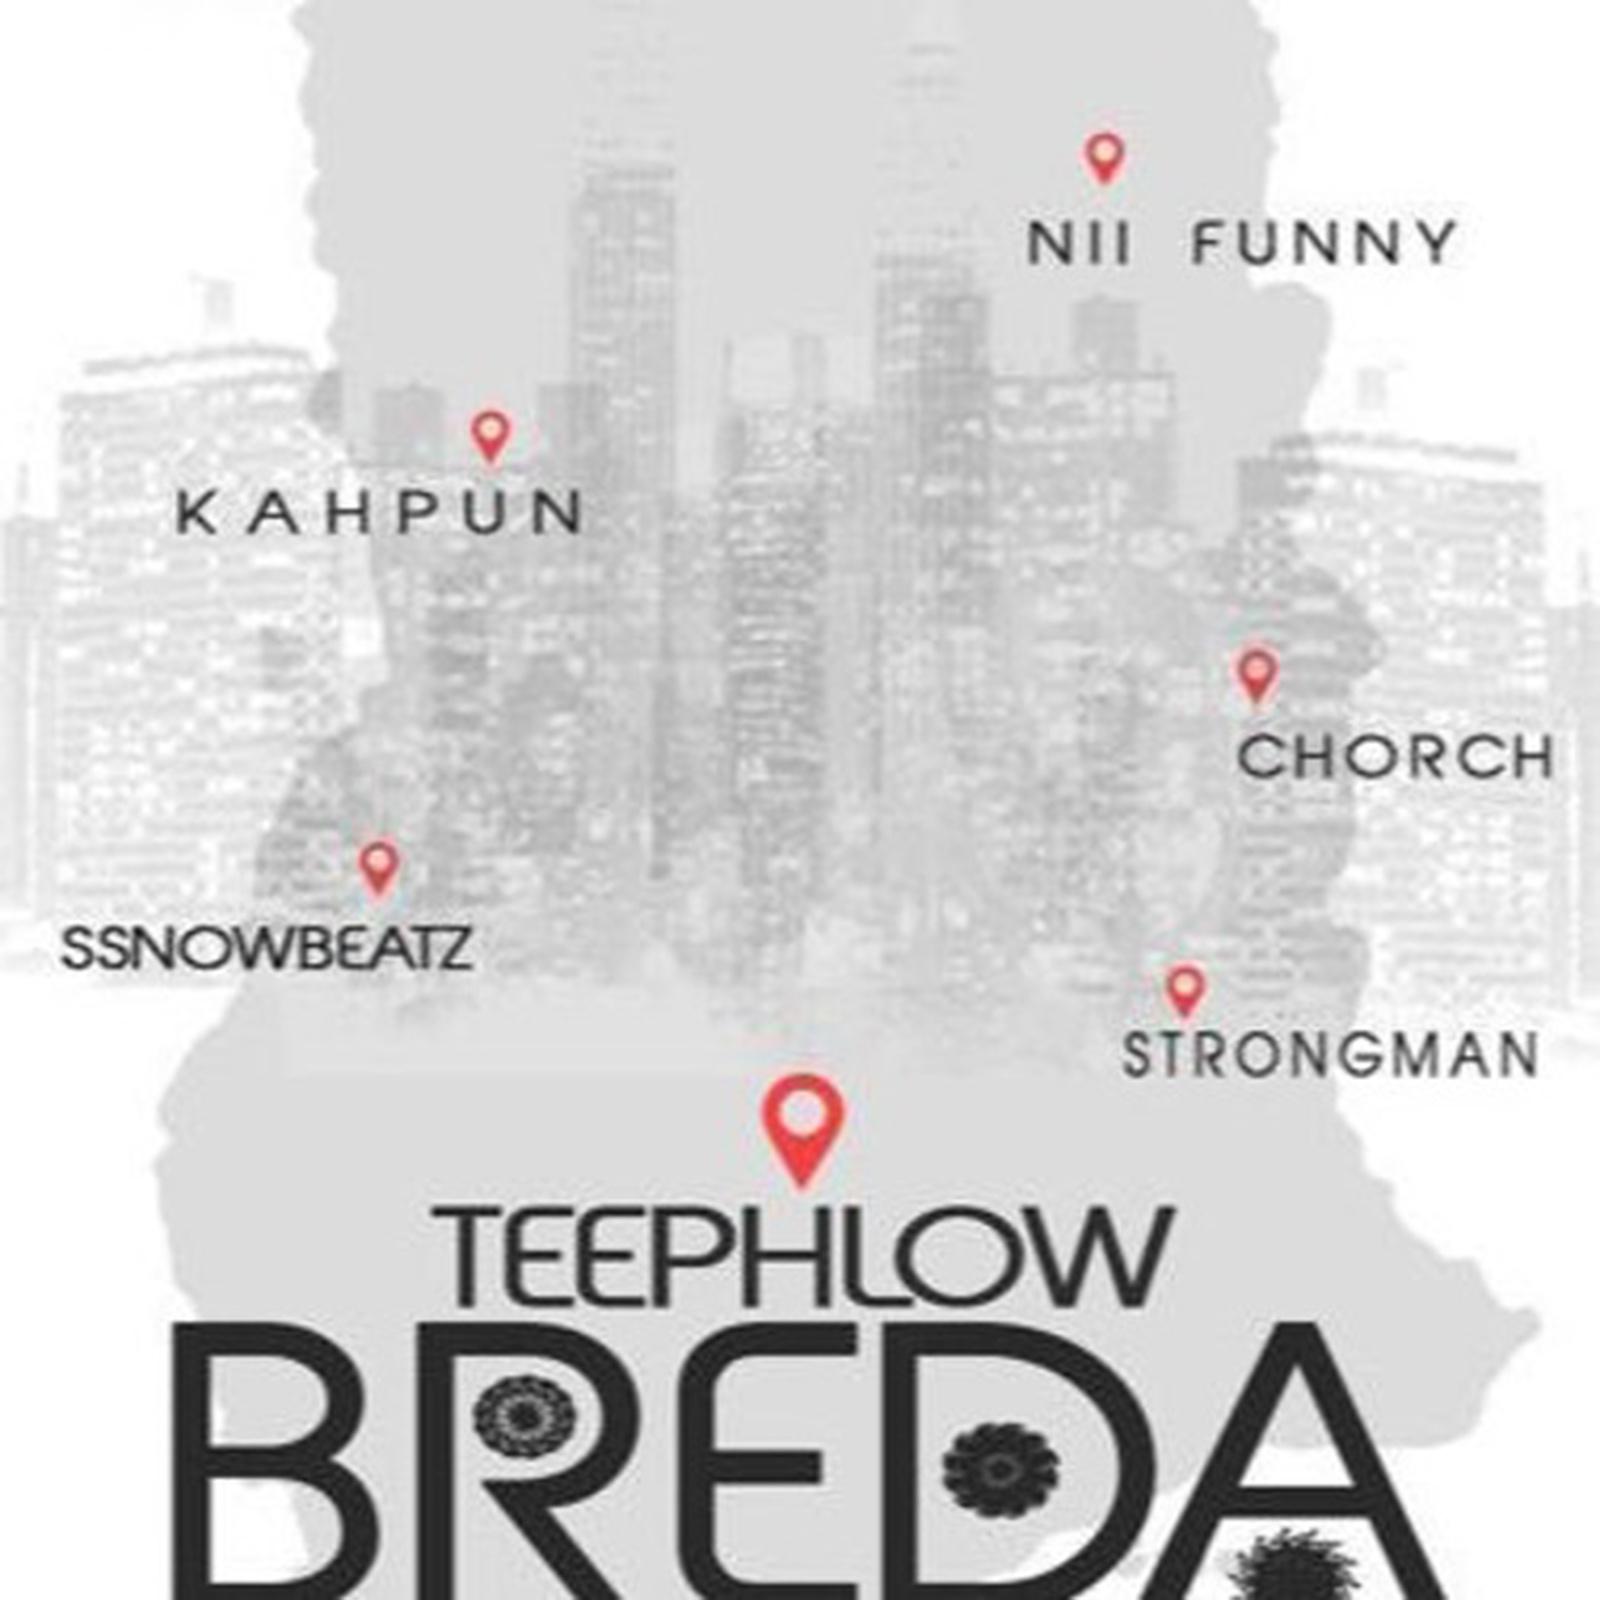 Breda Remix by TeePhlow feat. Strongman, Nii Funny, Ayesem, Chorch, Kahpun & SsnowBeatz